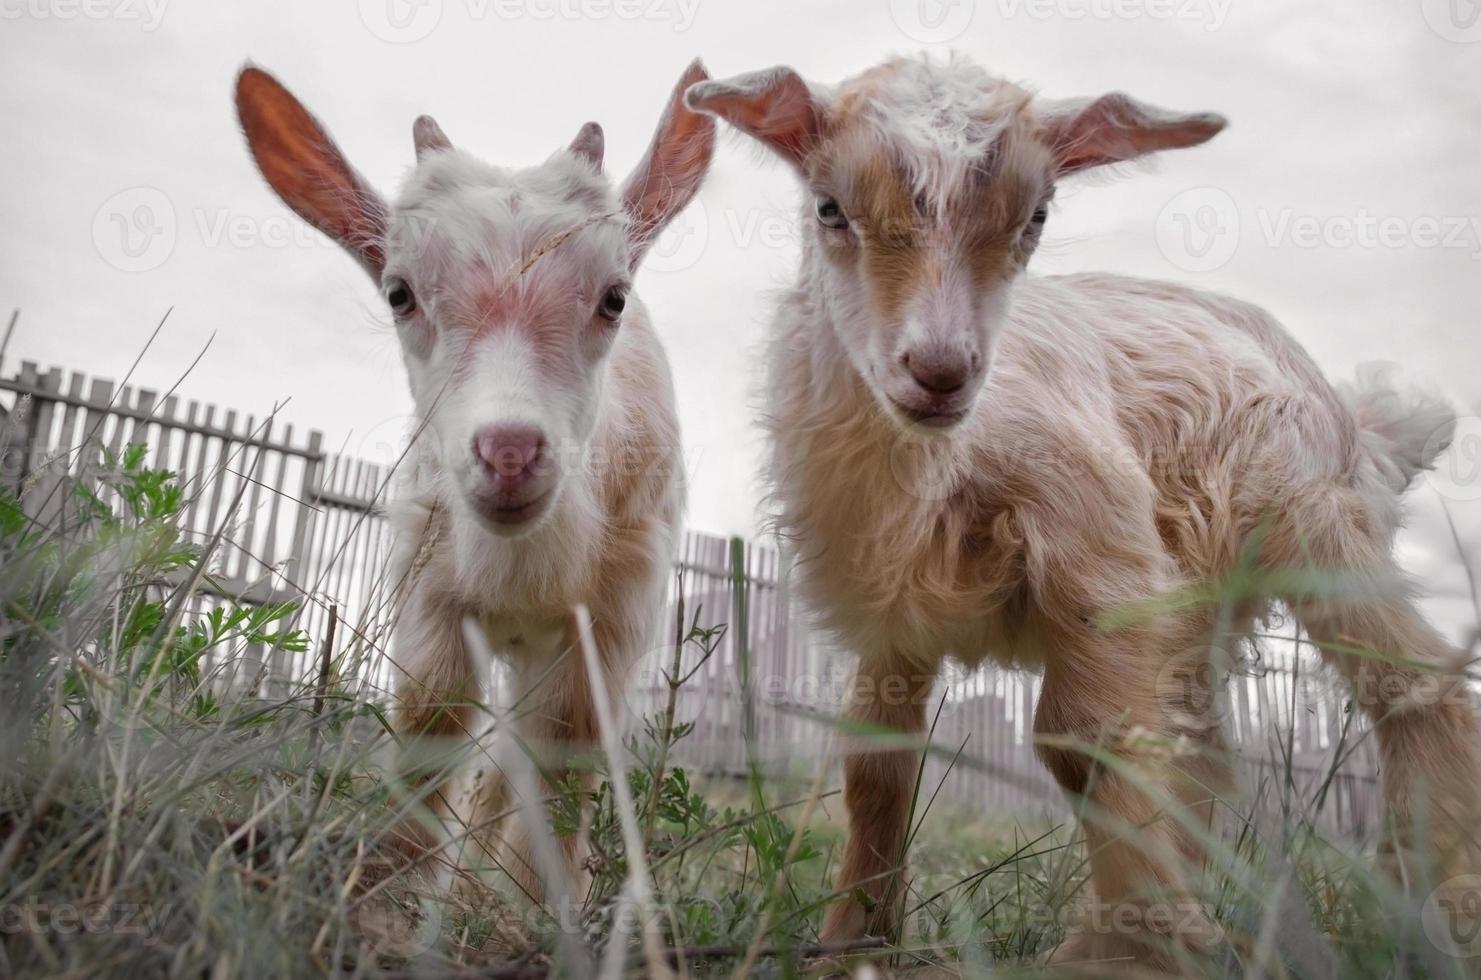 filhos de cabra foto